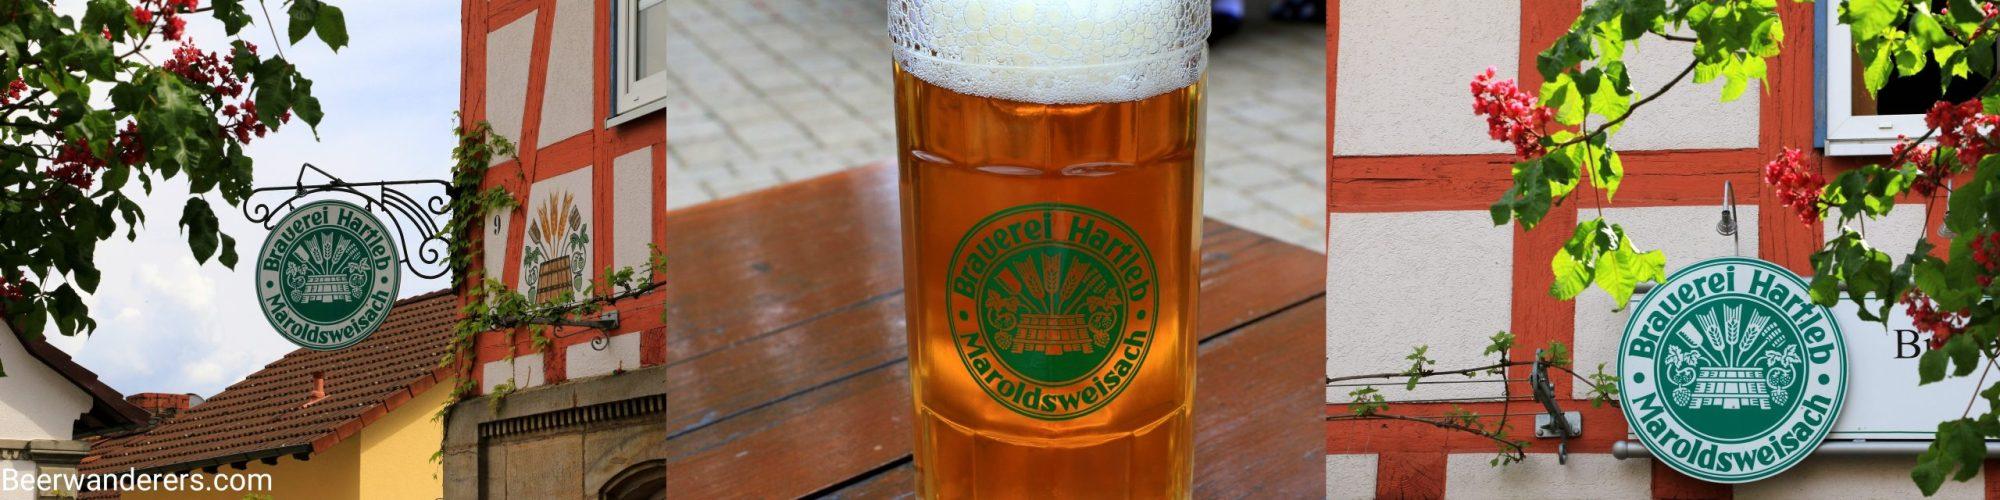 brewery sign beer in logo mug